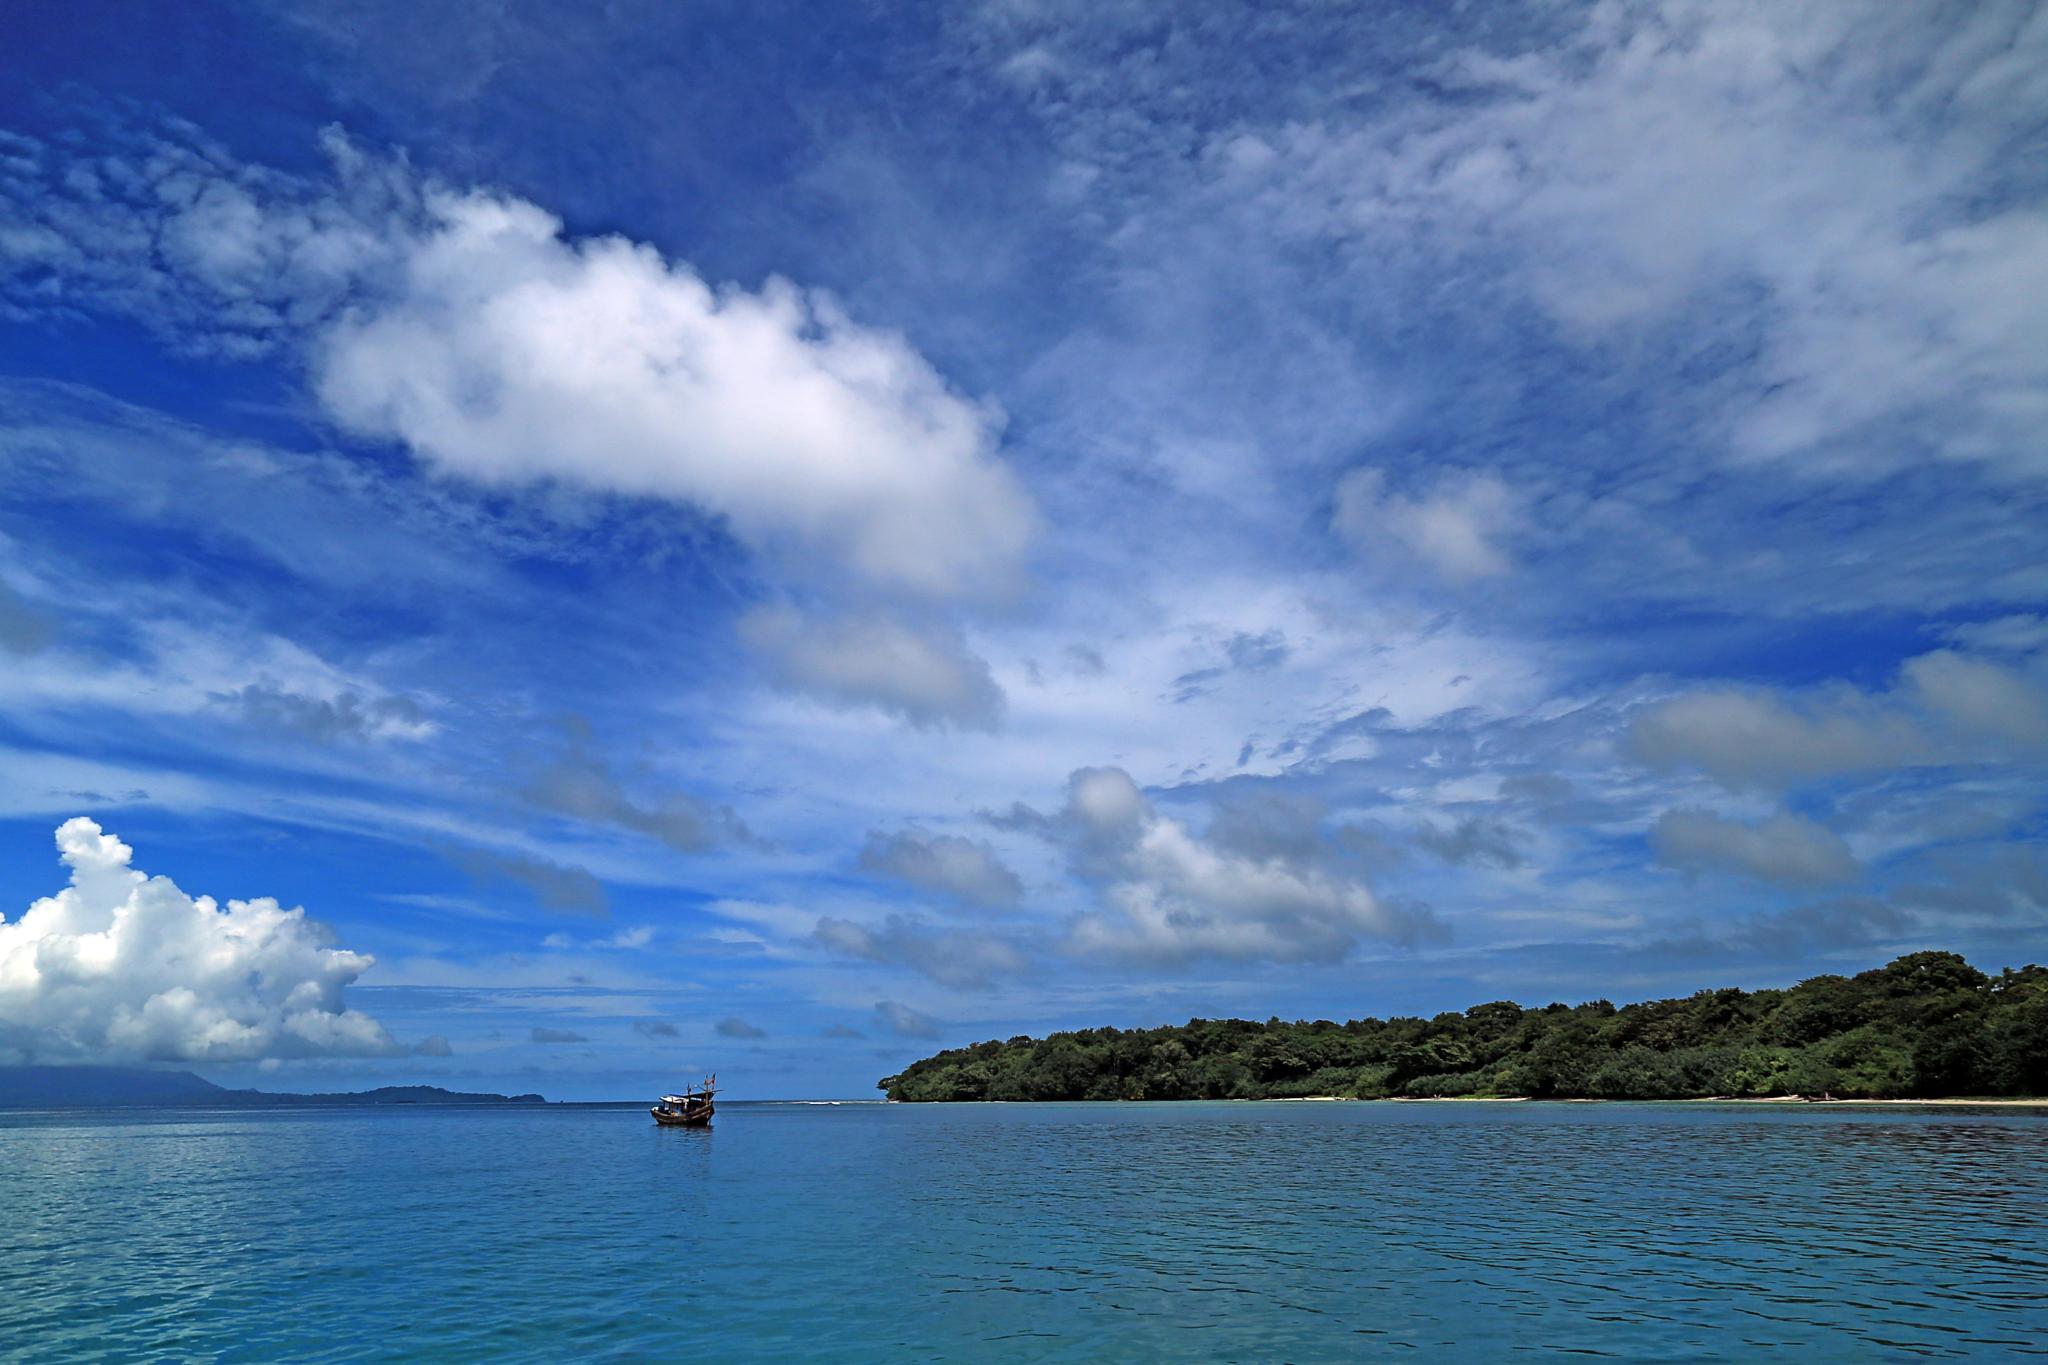 The ship, sky and sea by herrylebran